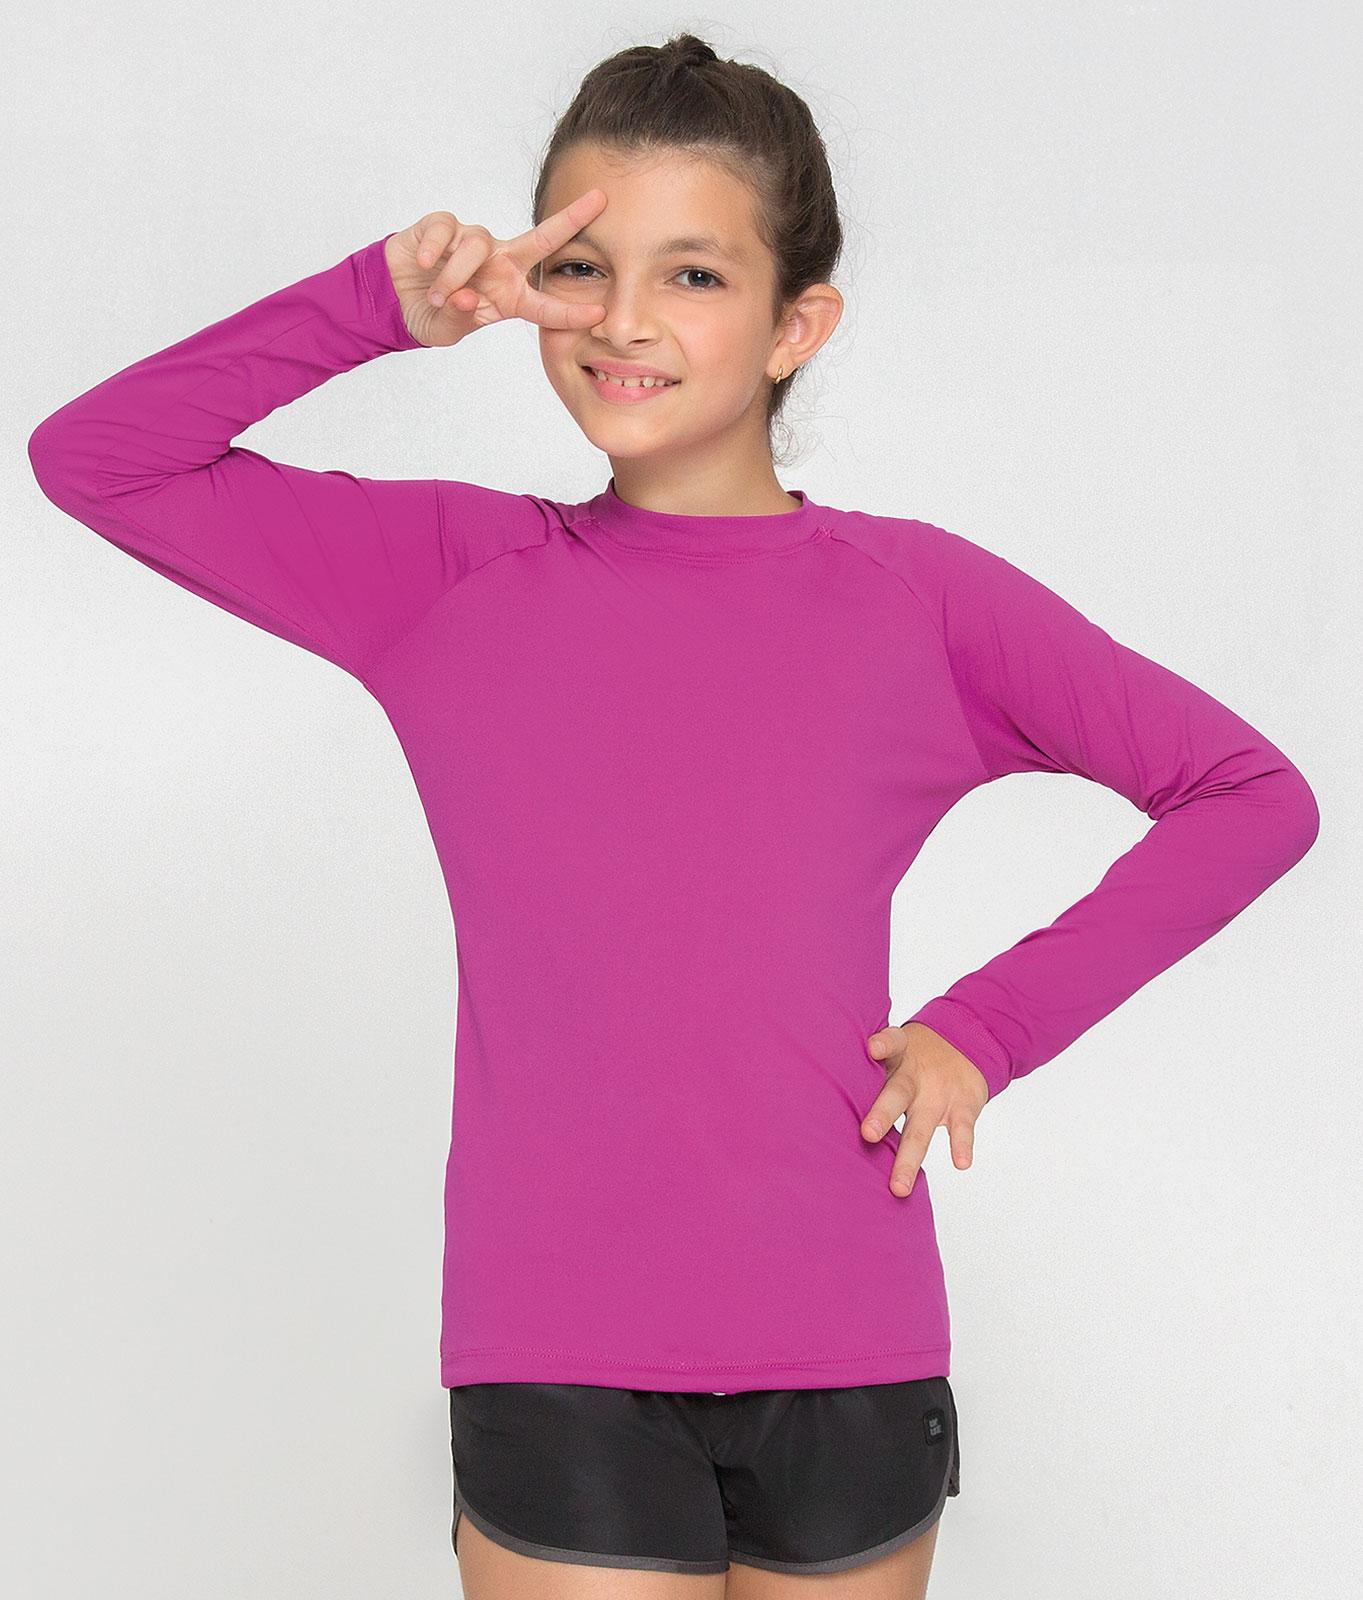 UV LINE Camiseta Uvpro ML Infantil Rosa Batom Proteção Solar